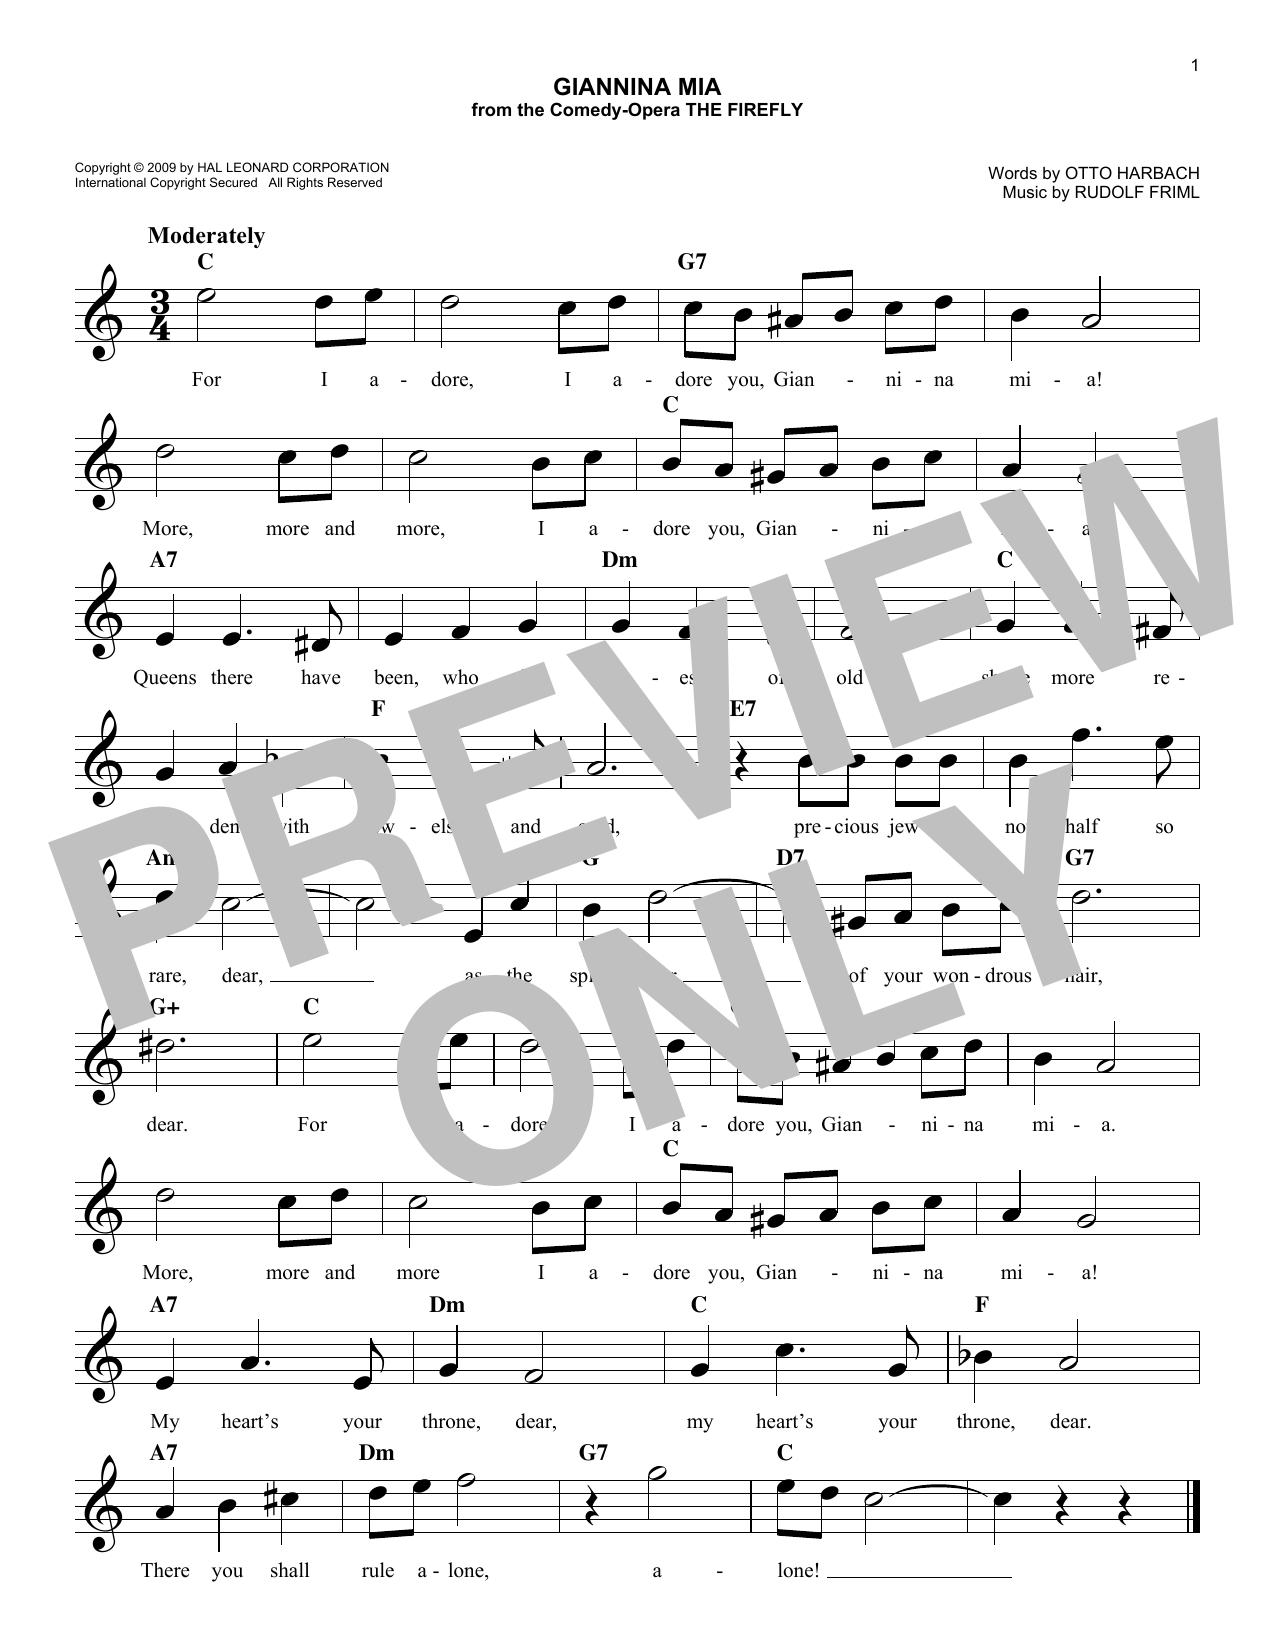 Rudolf Friml Giannina Mia sheet music notes and chords. Download Printable PDF.